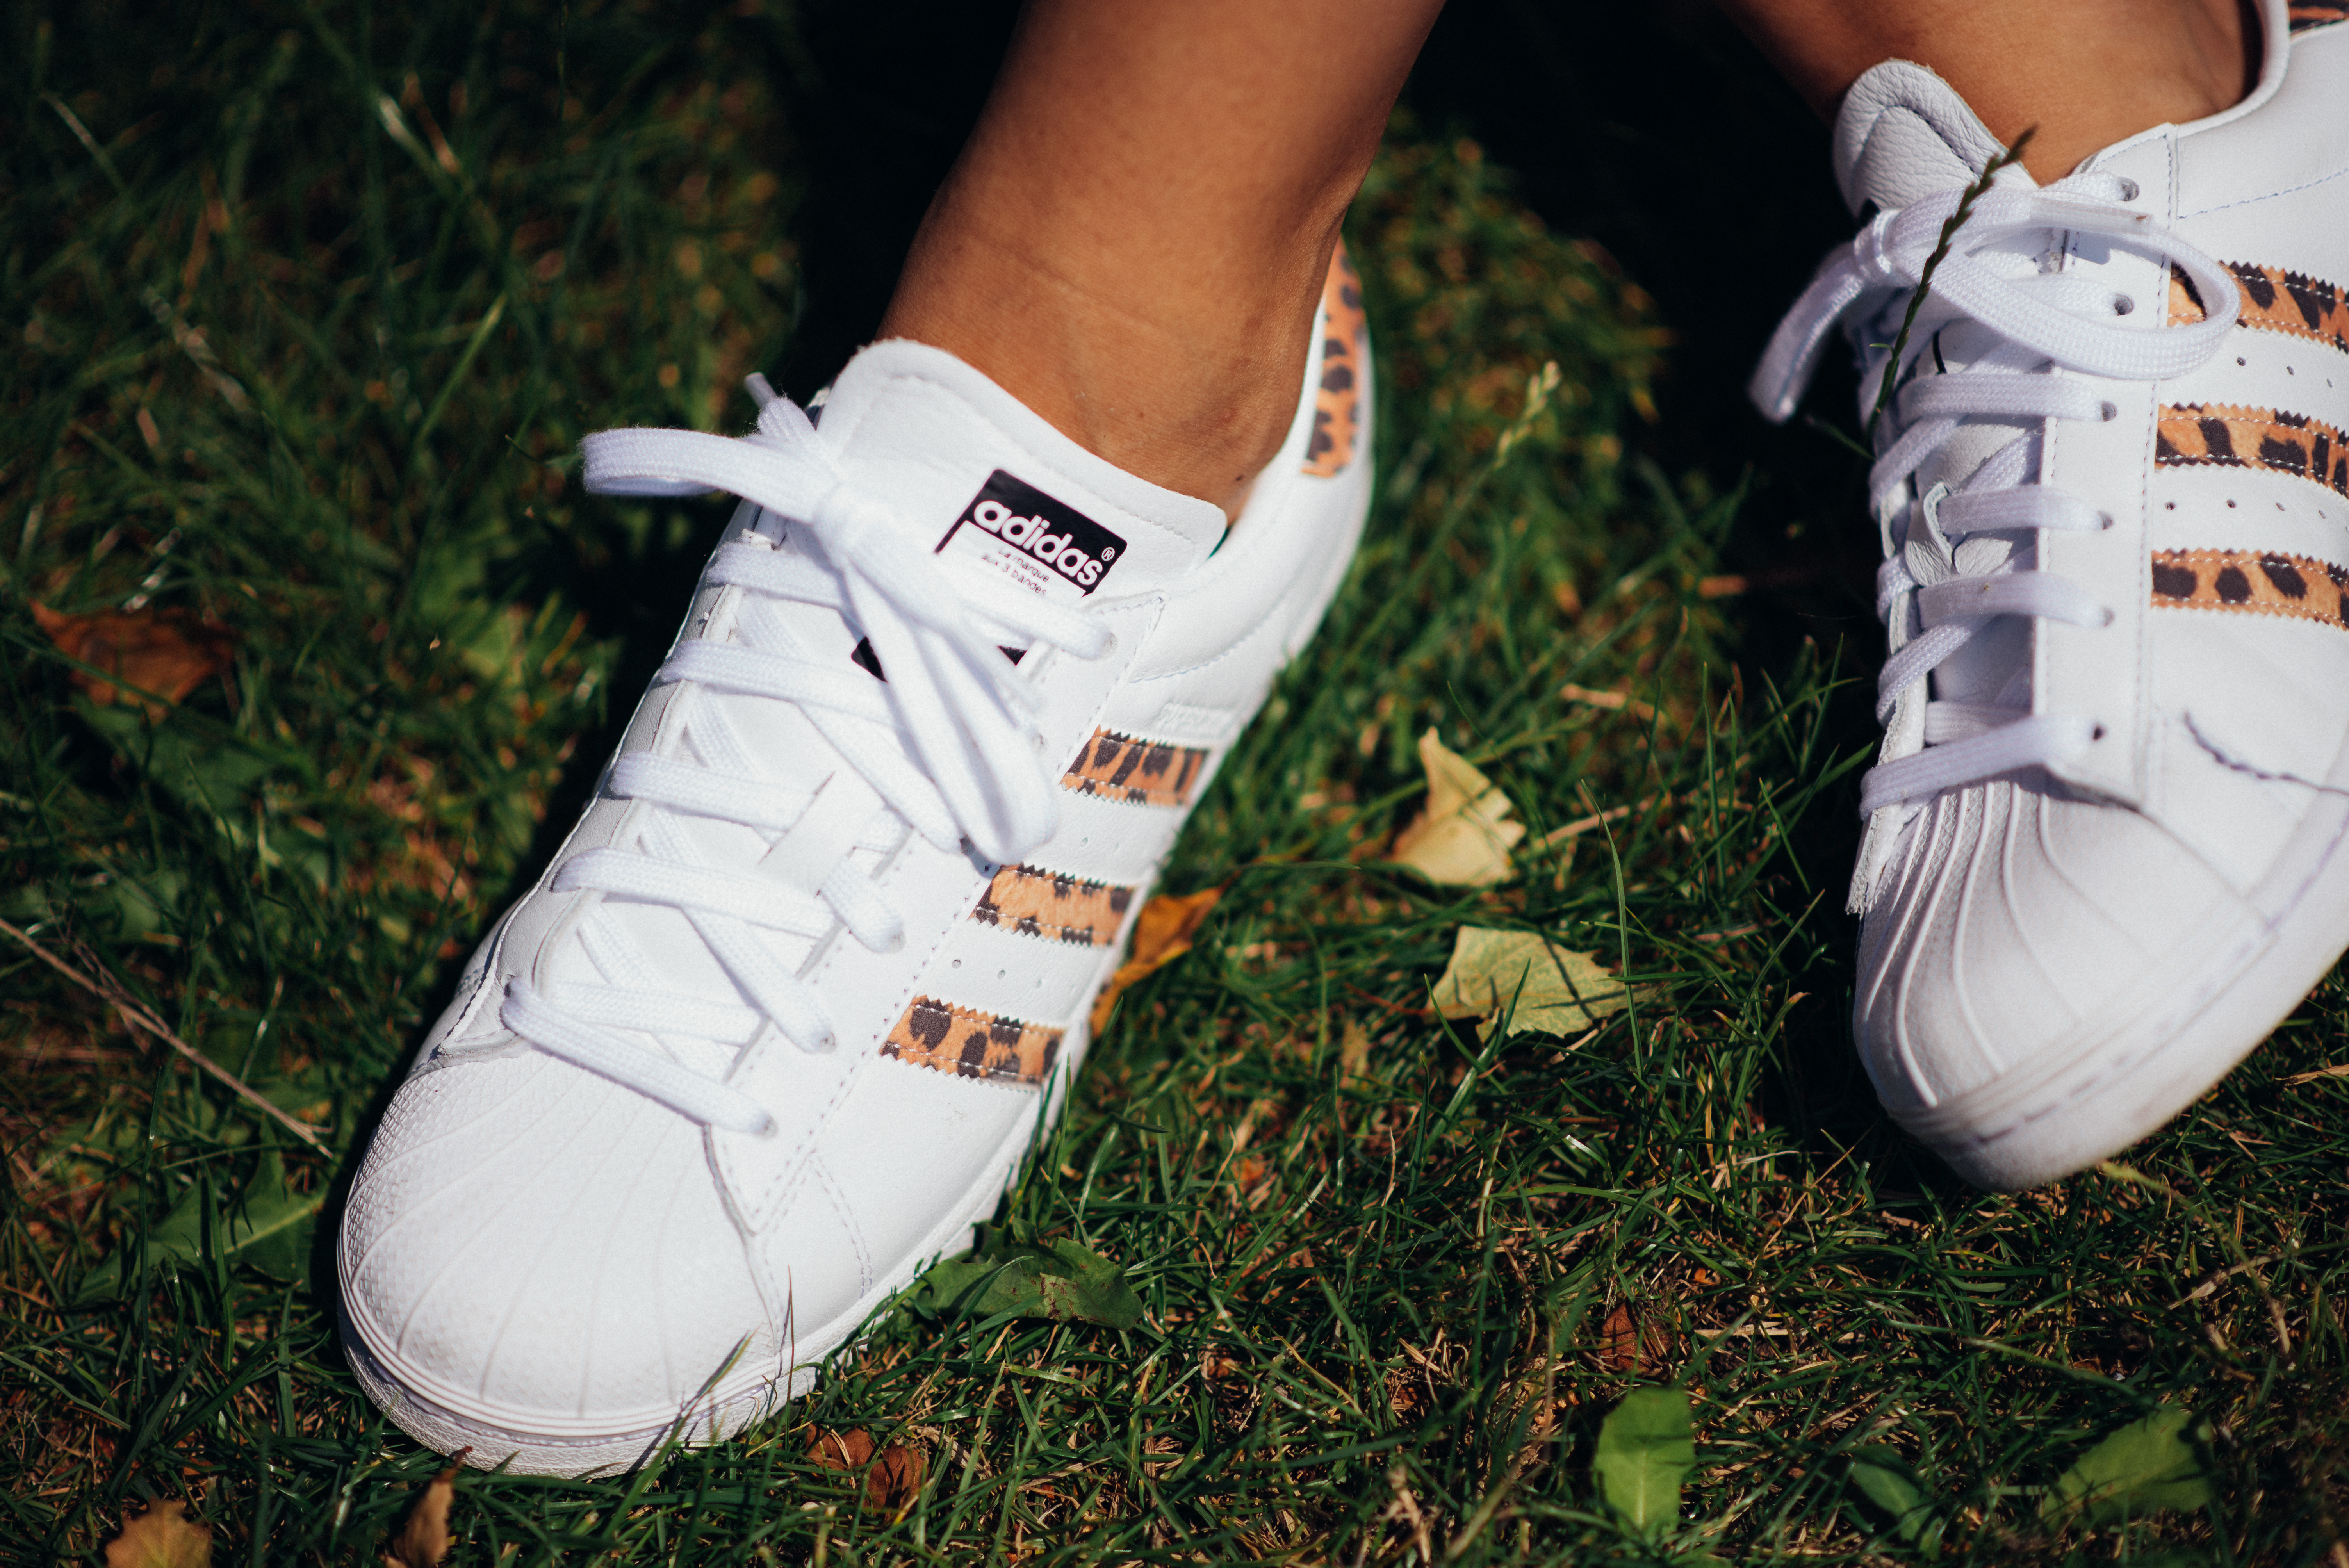 Sportshowroom, sneaker, sneakers, adidas, superstar, adidas superstar, original, panter, tijger, leopard, zomer, SS18, jurkje, geel, defshop, def-shop, outfit, ootd, xmariekie, XMARIEKIE, blog, blogger